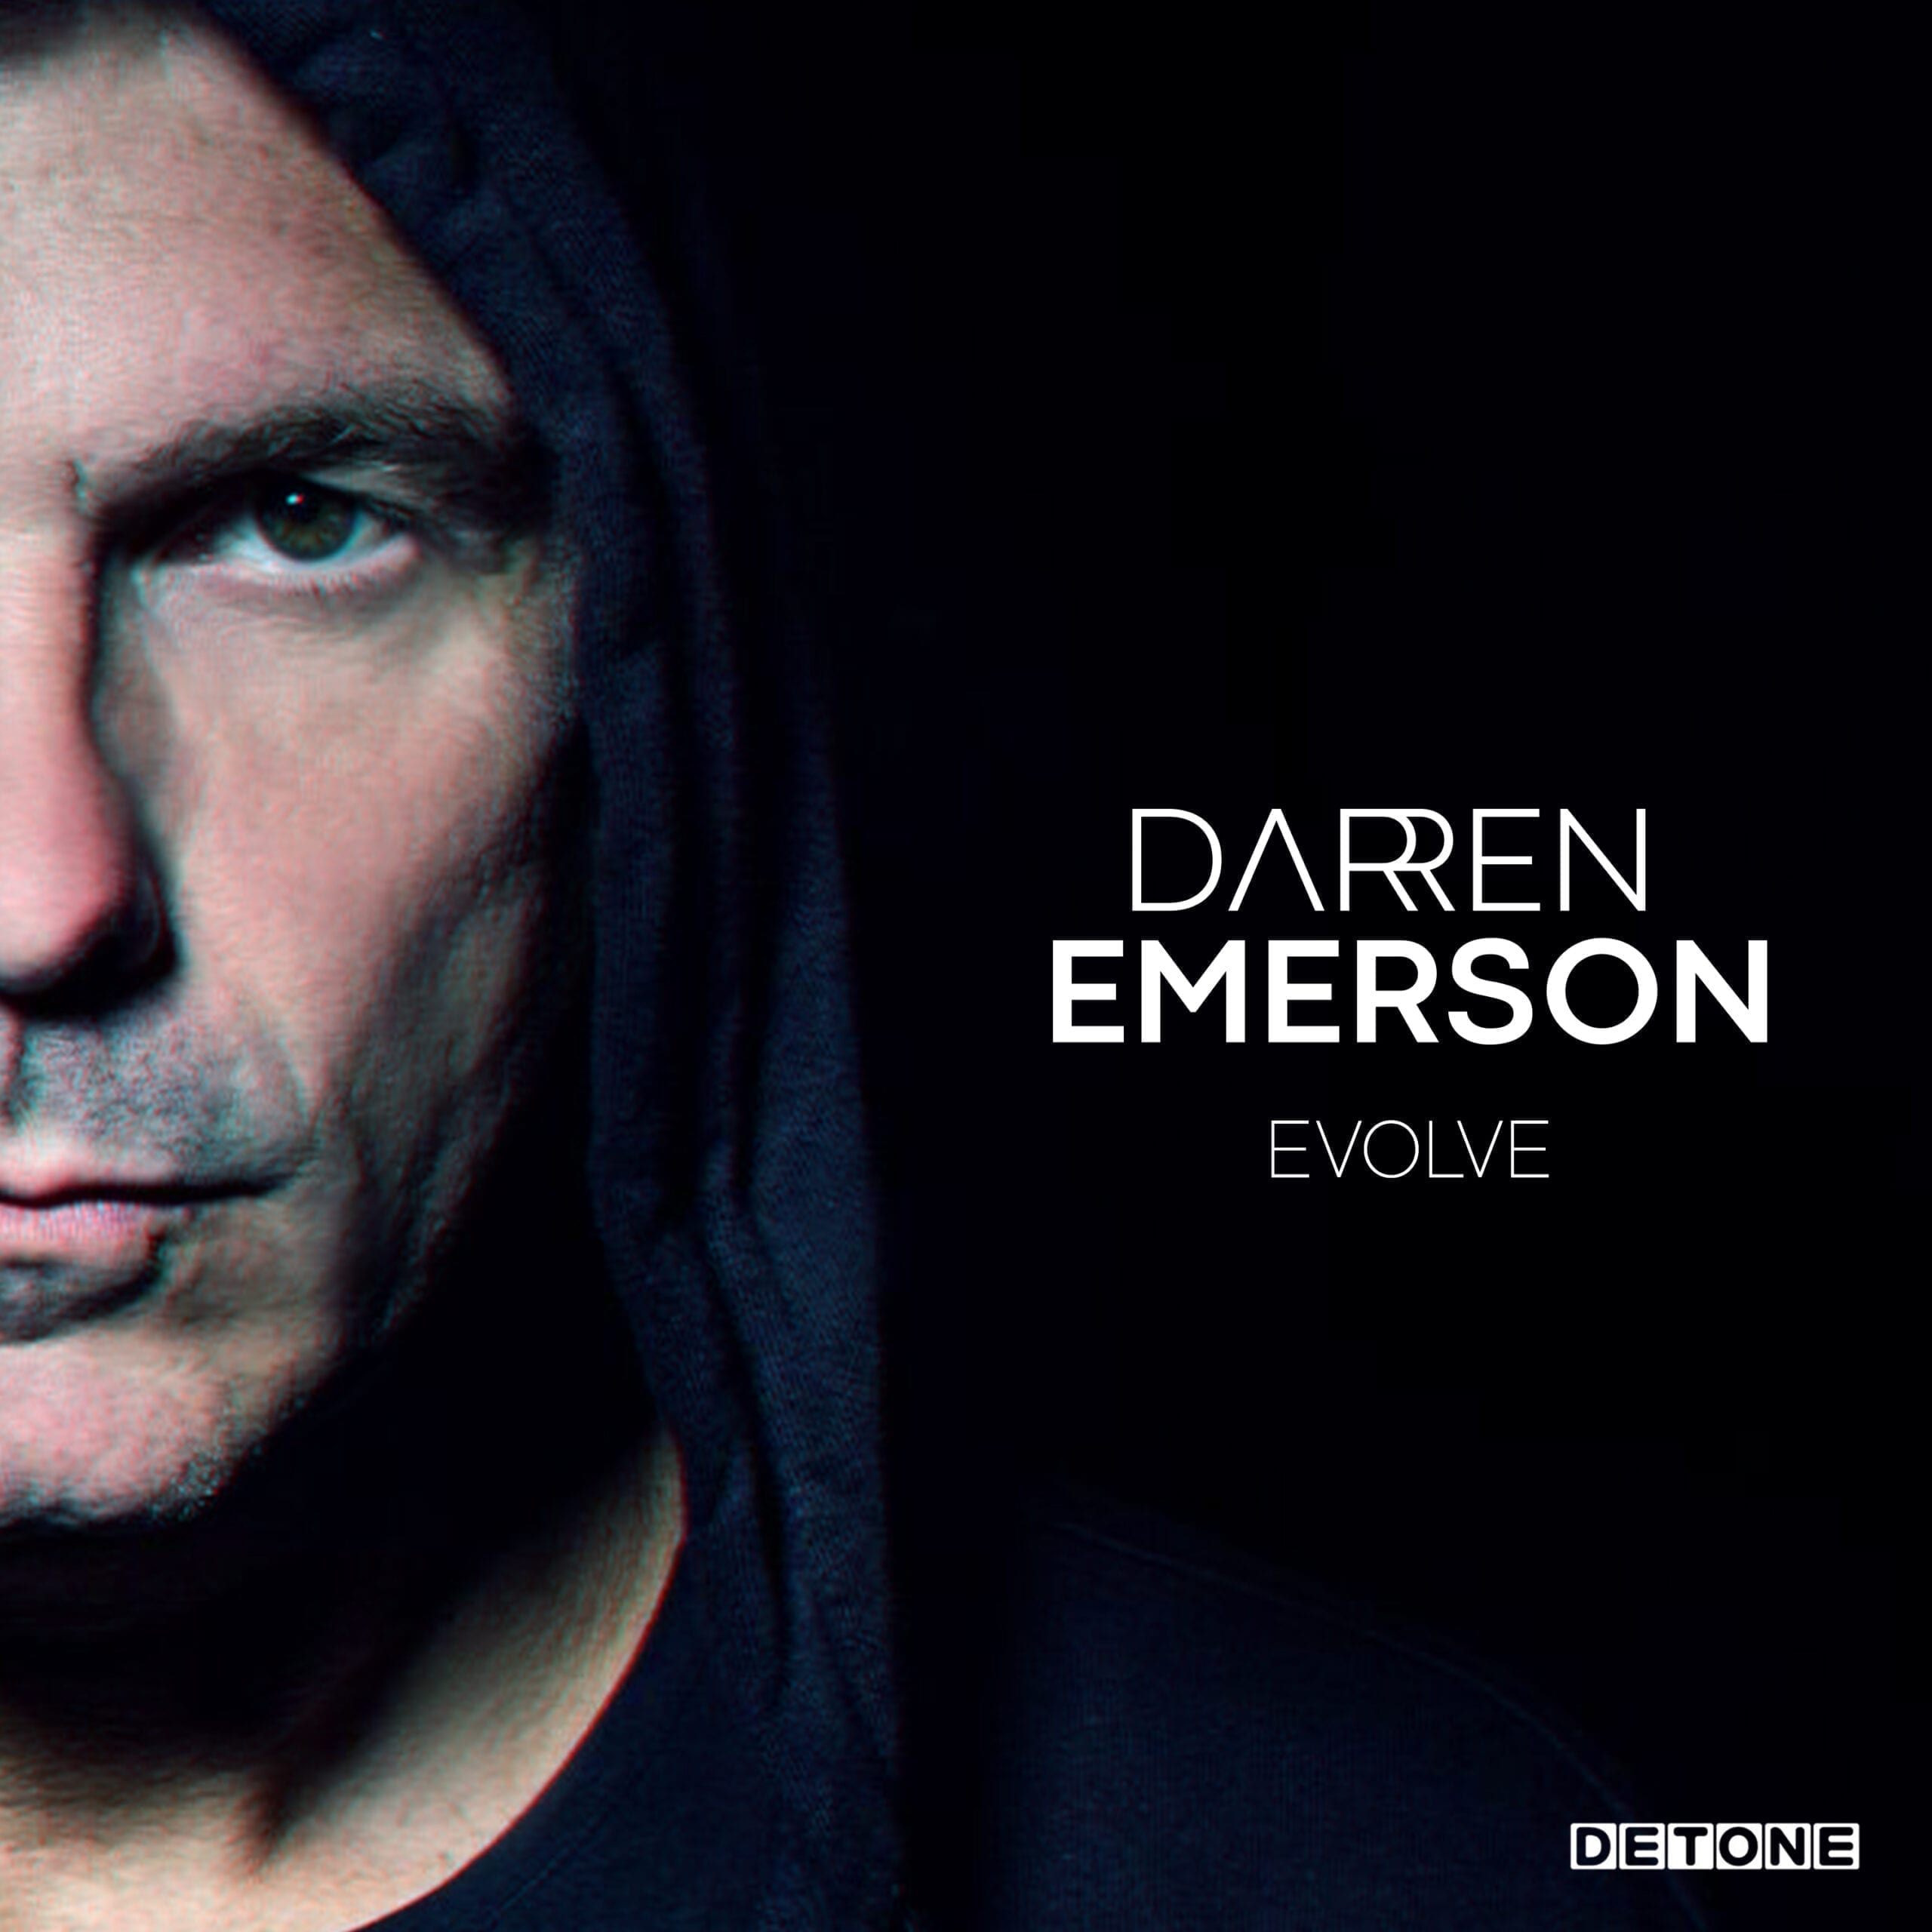 Darren Emerson 'Evolve' Mix Compilation Detone